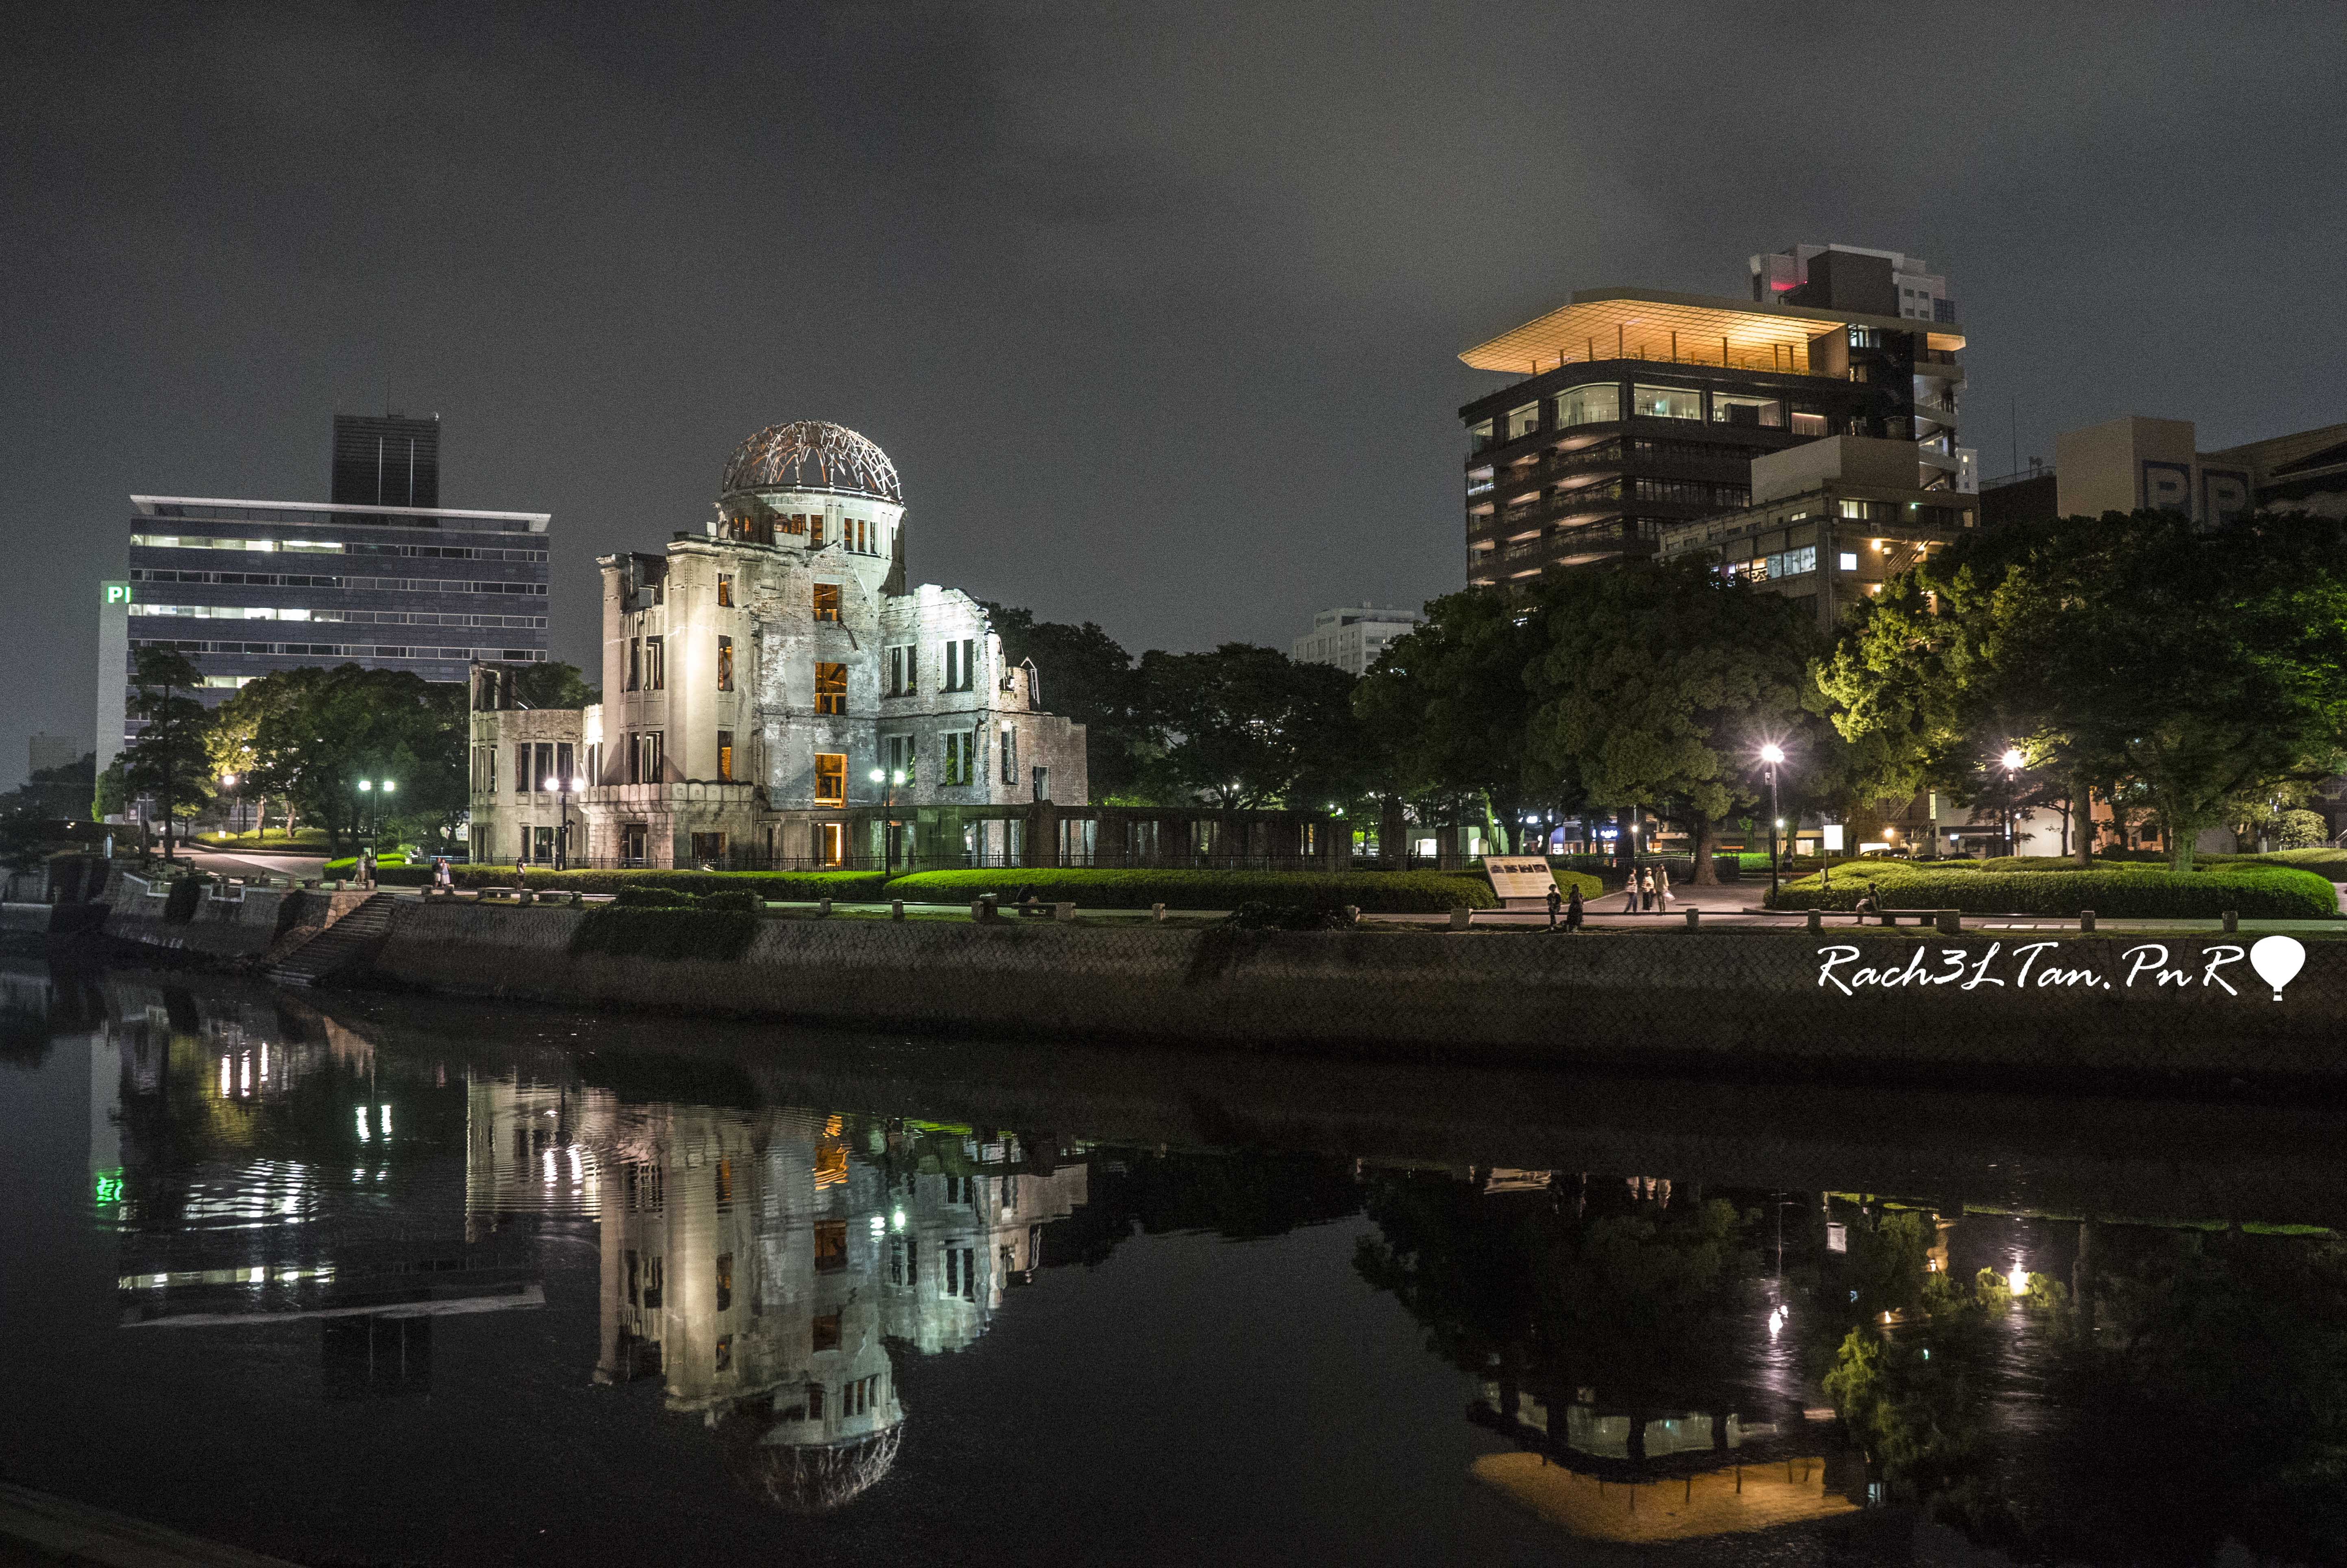 Travel Blog: Hiroshima By Rachel Tan